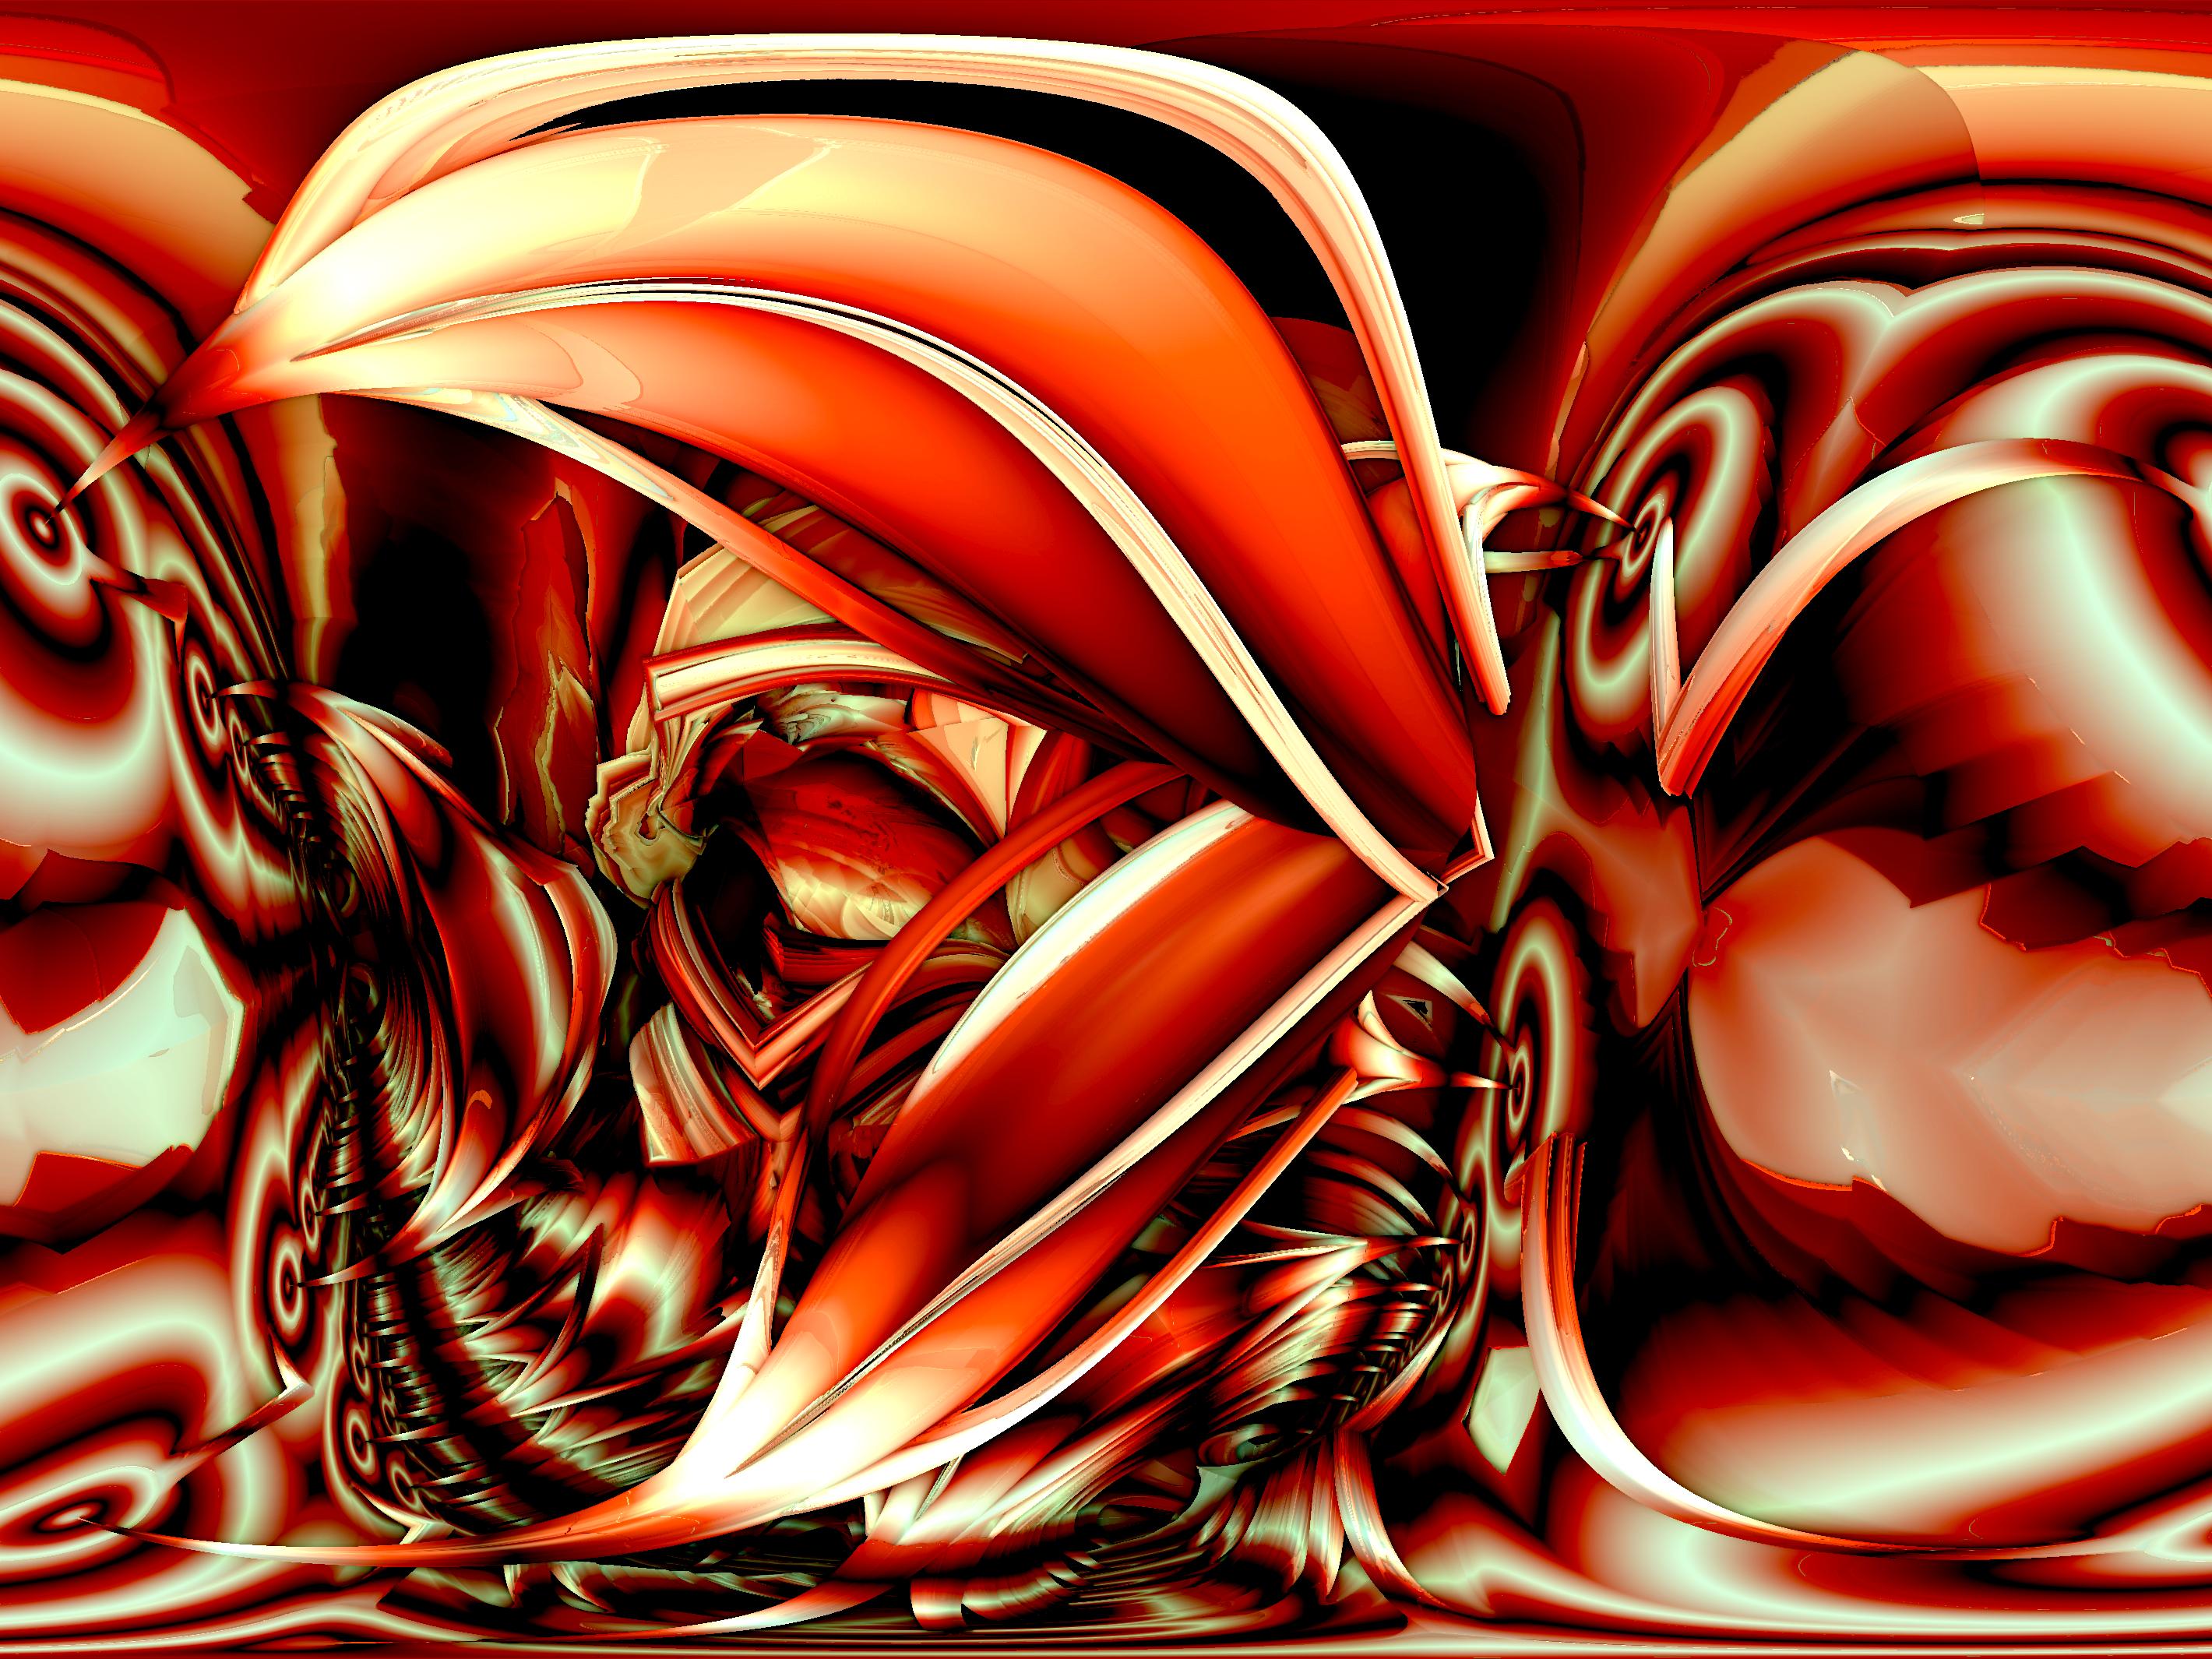 Amazing Surf 2 and Quadrat3D by IAmThatStrange